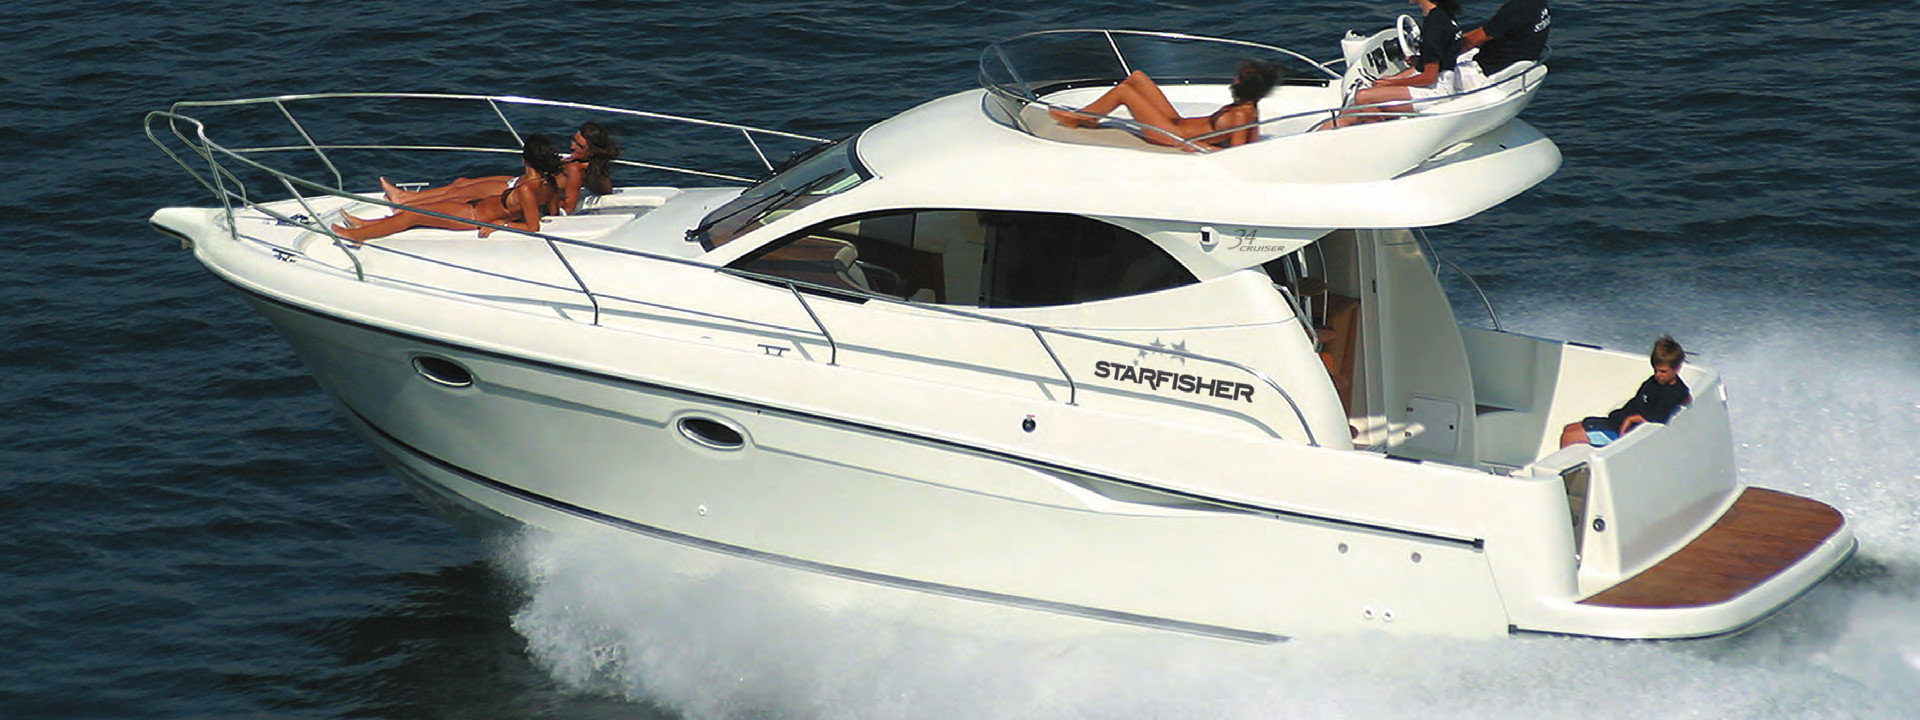 Starfisher Boats - ST34